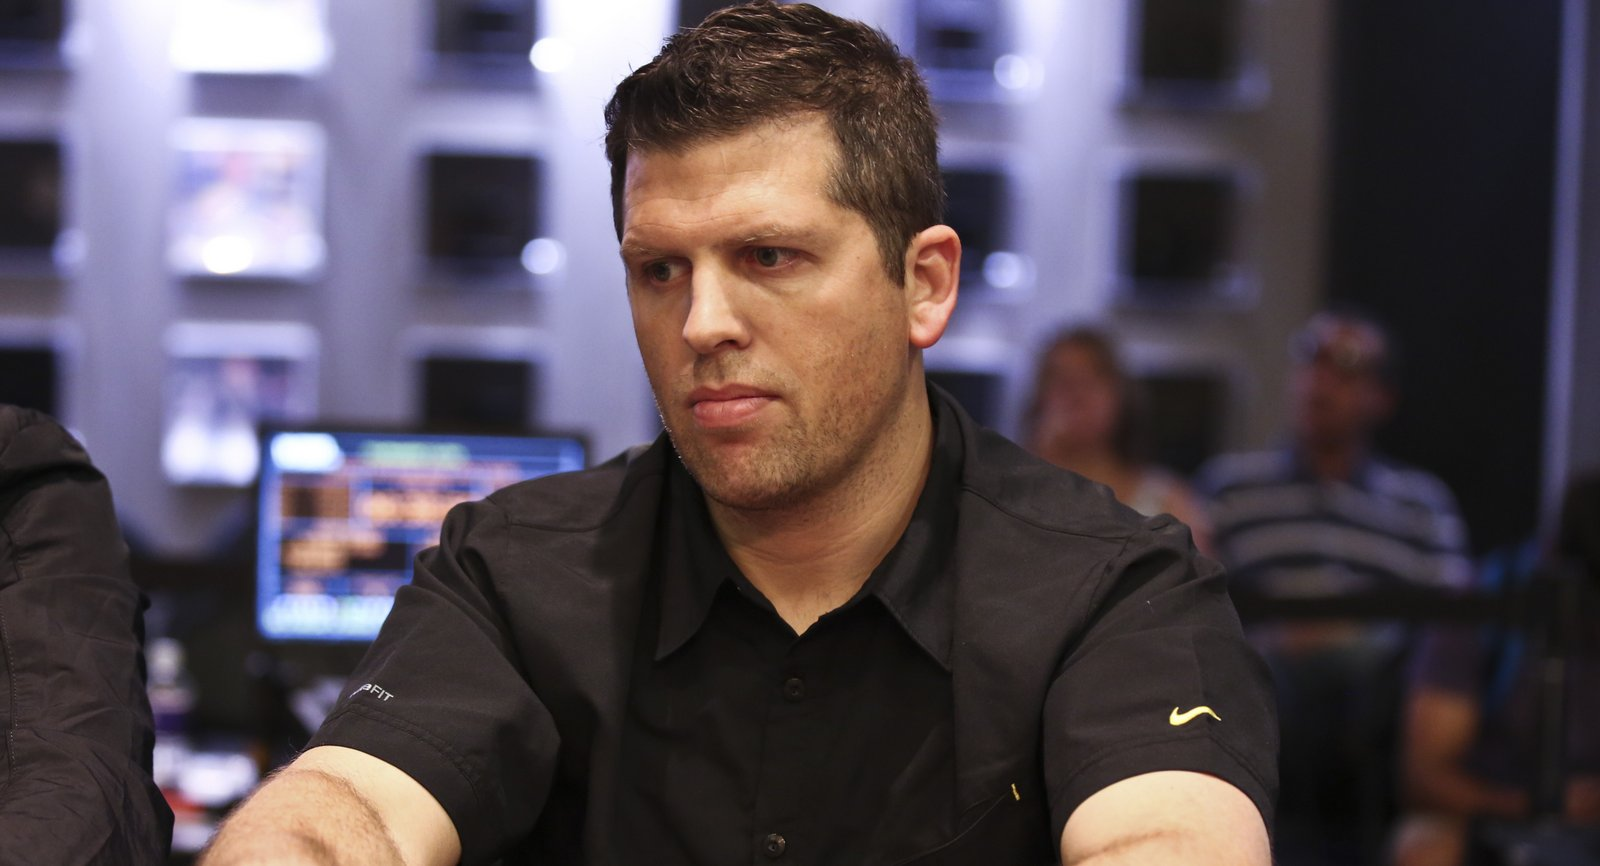 Greg Hobson